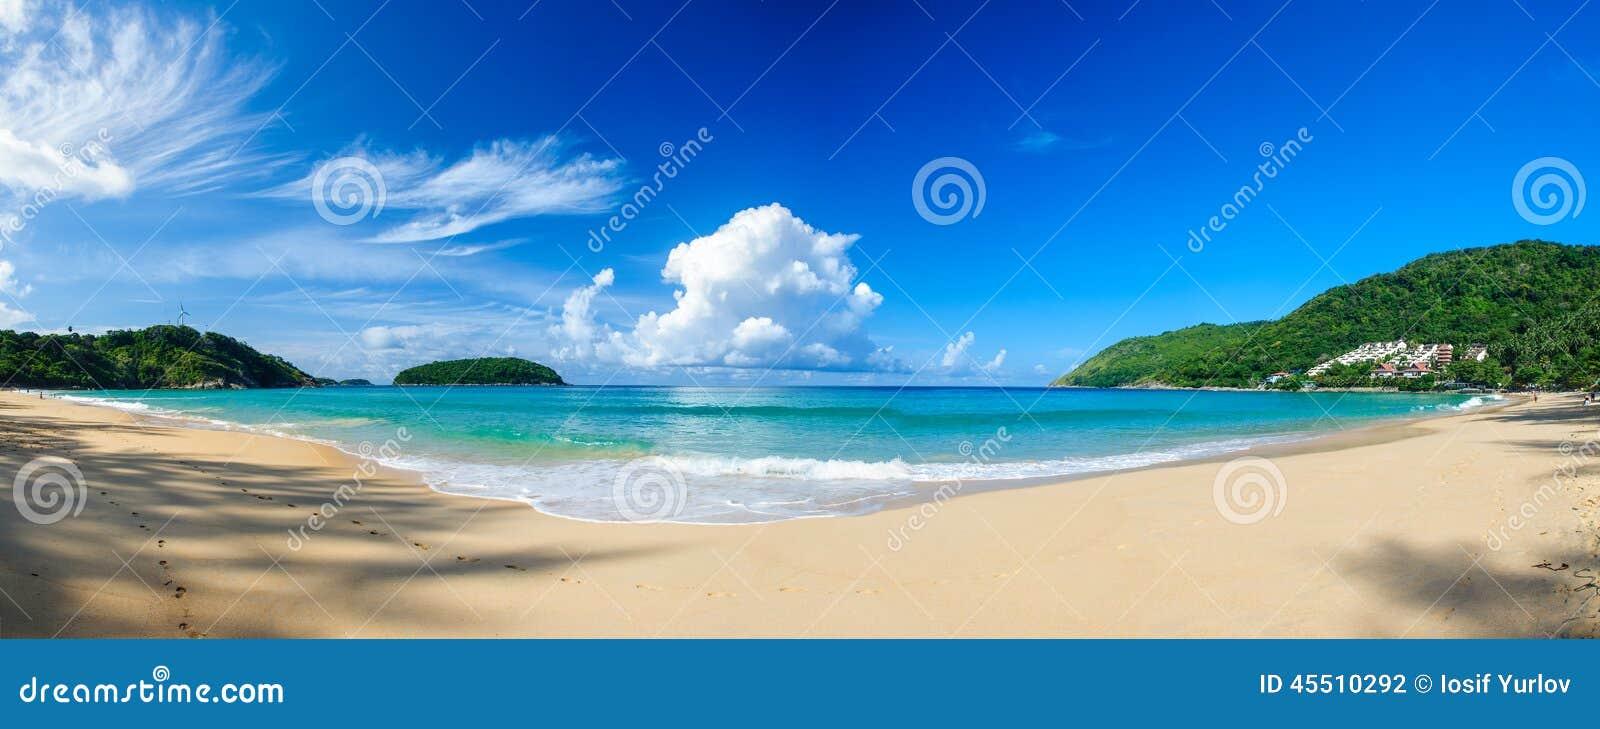 Vue panoramique de Nai Harn Beach à Phuket